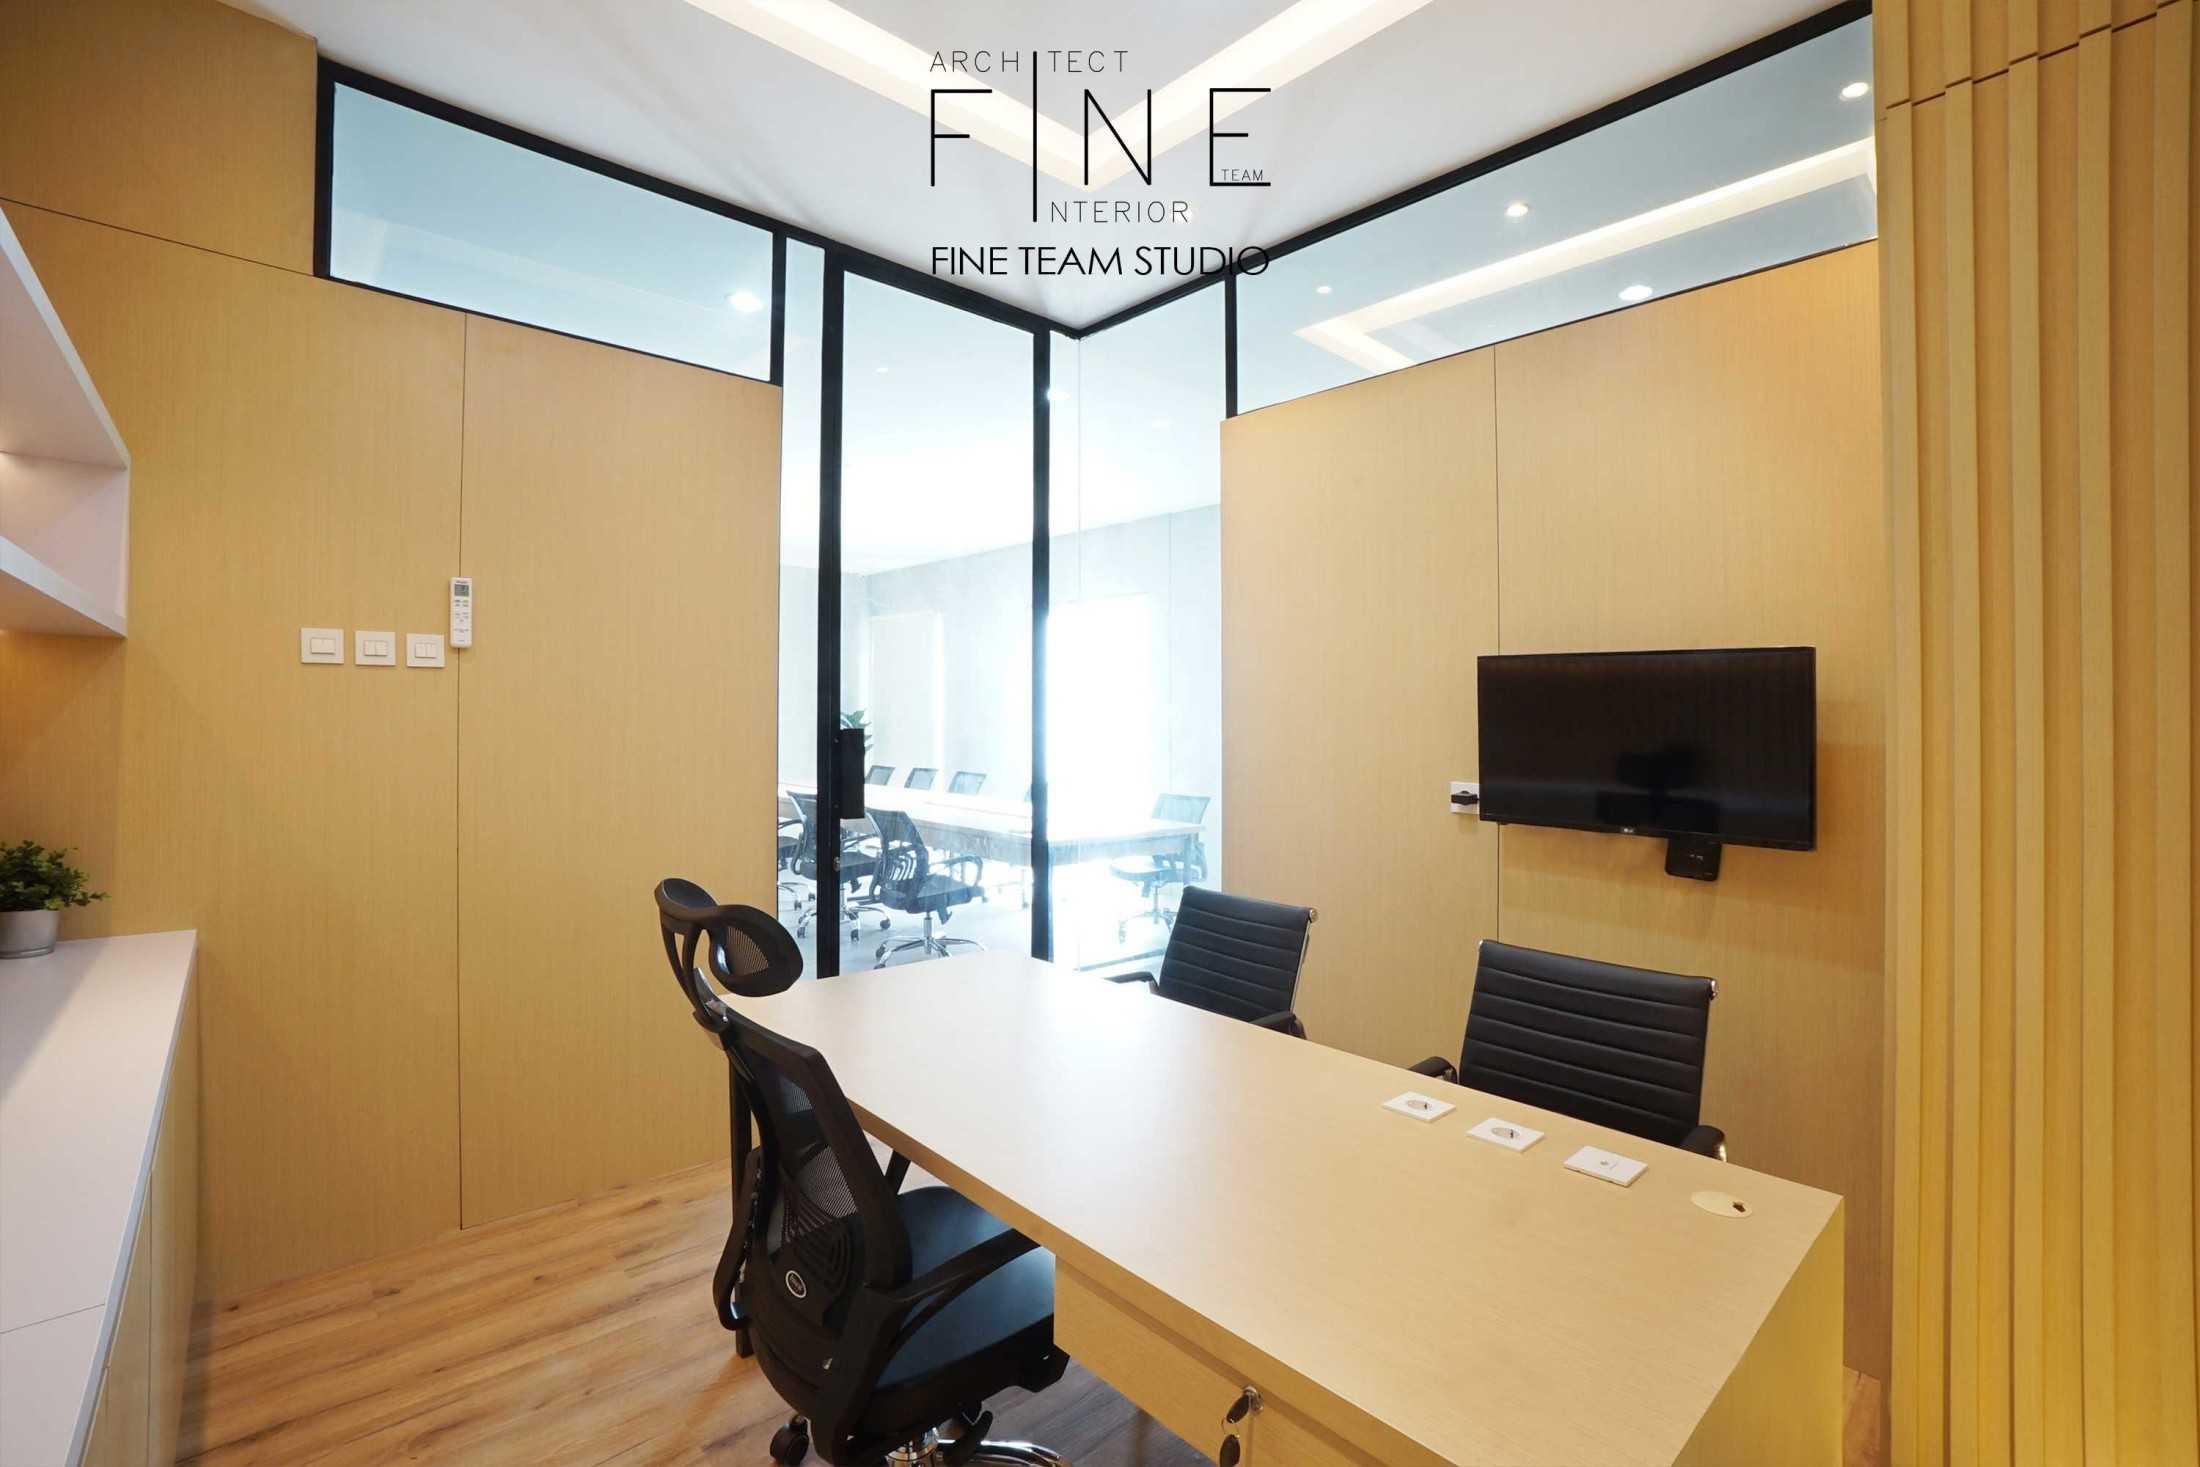 Fine Team Studio Mob Office Cikupa, Tangerang, Banten, Indonesia Cikupa, Tangerang, Banten, Indonesia Fine-Team-Studio-Mob-Office  71111